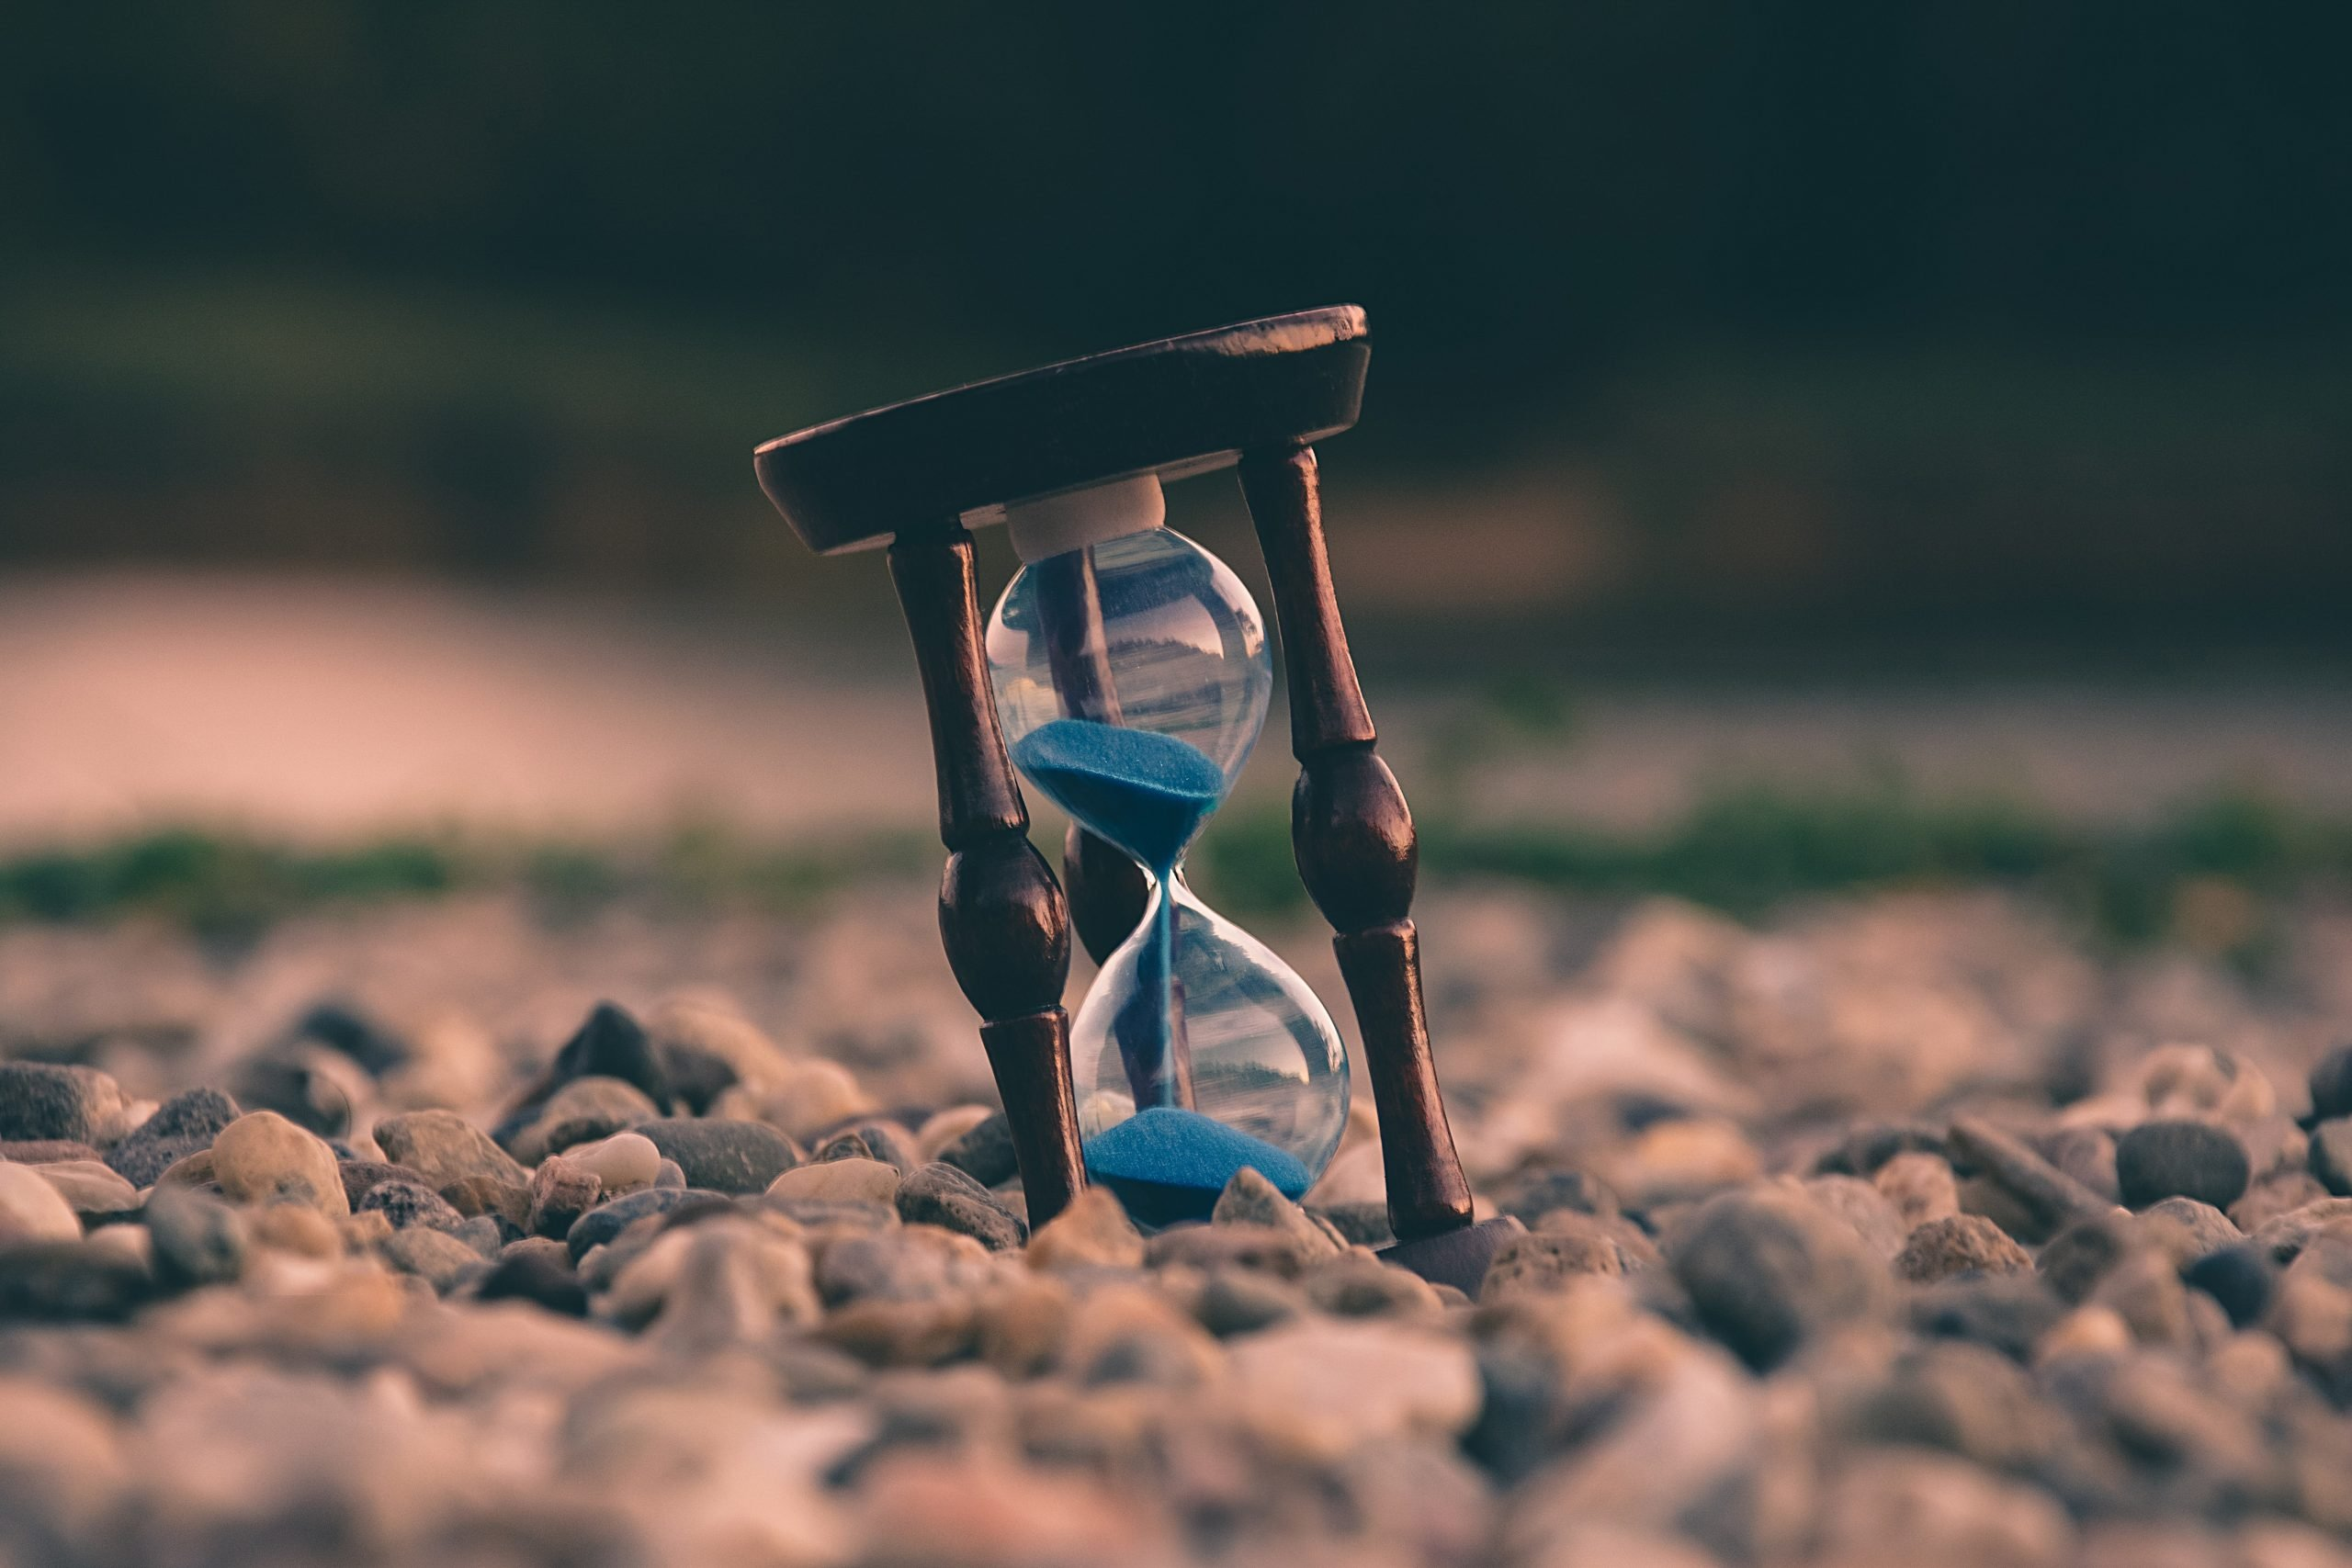 Hourglass on a stony beach